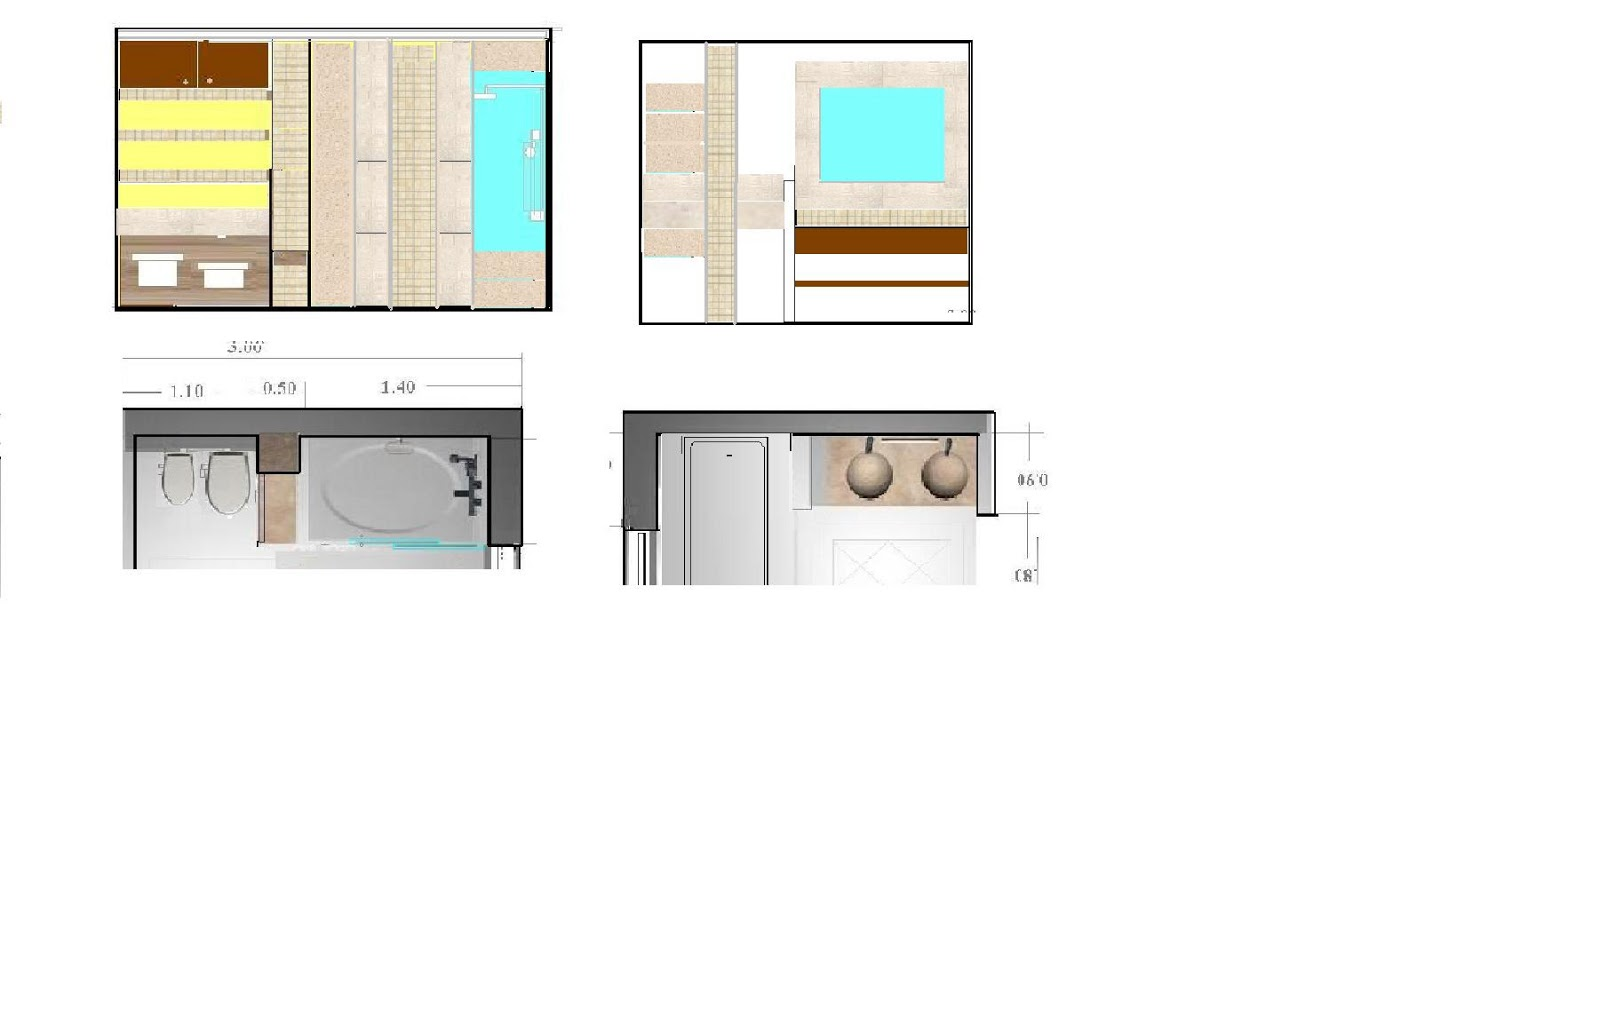 Interiorismo y decoracion lola torga dise o de un ba o - Diseno de un bano ...